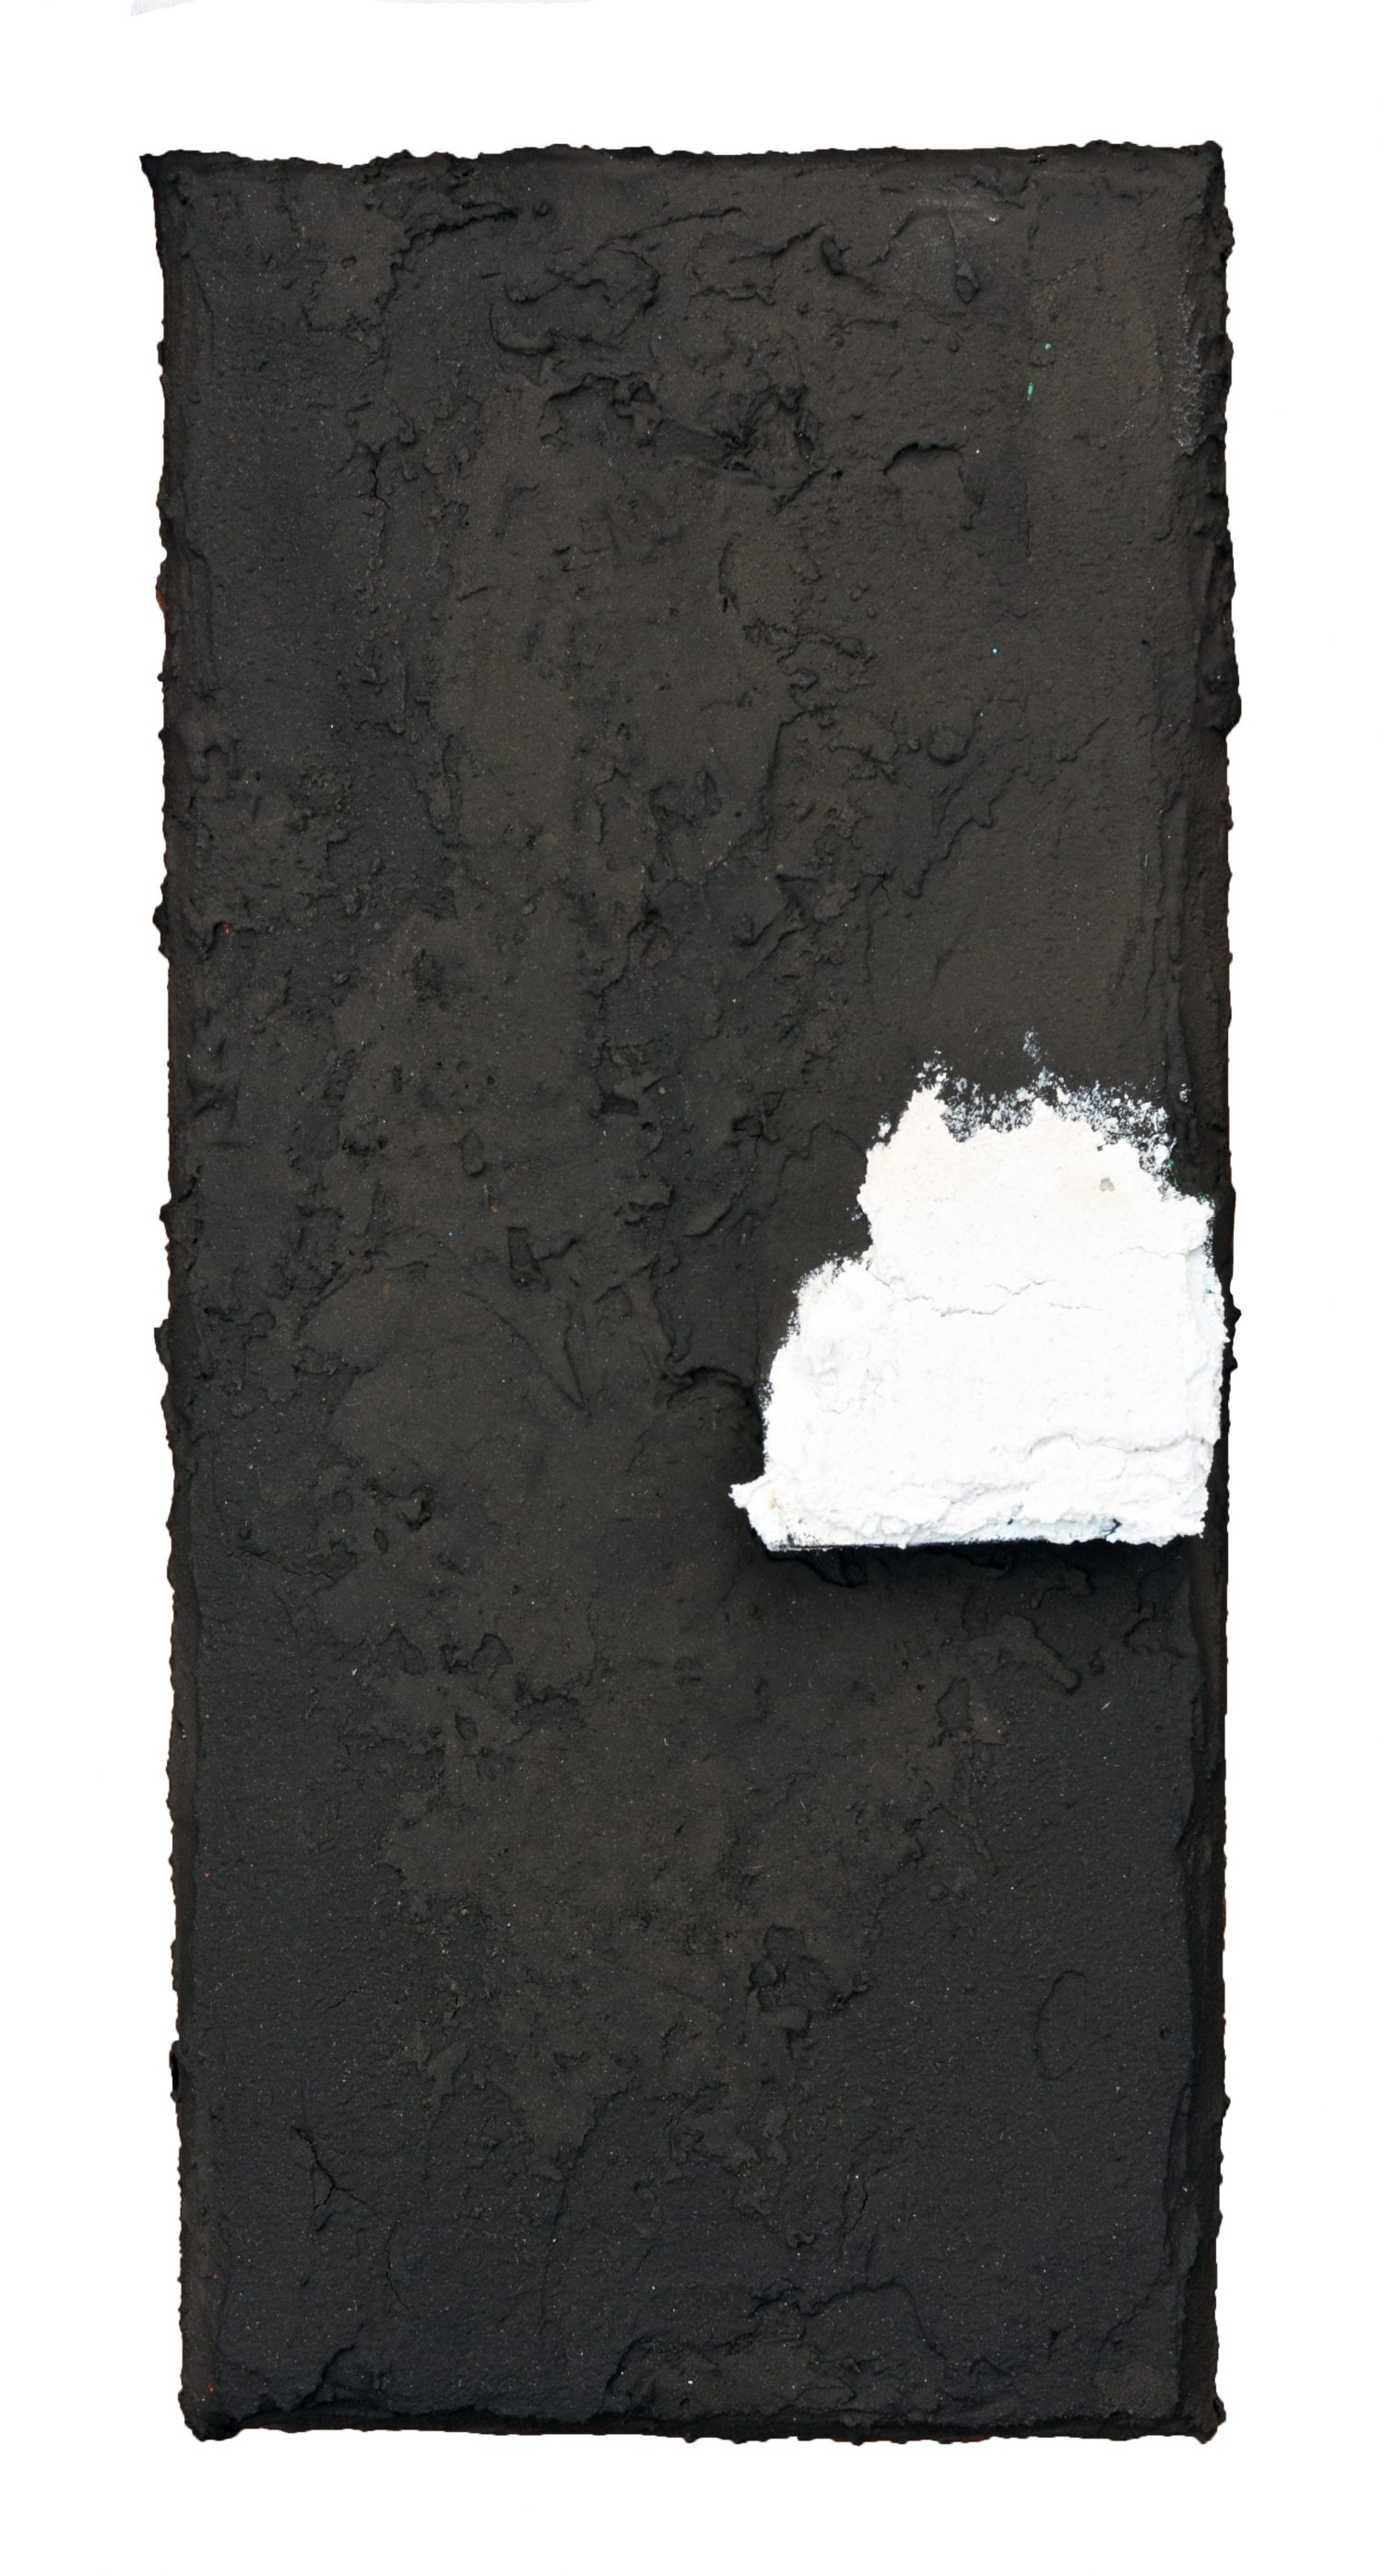 Angel Alonso - Témoin blanc - 32 x 15 cm - 1980